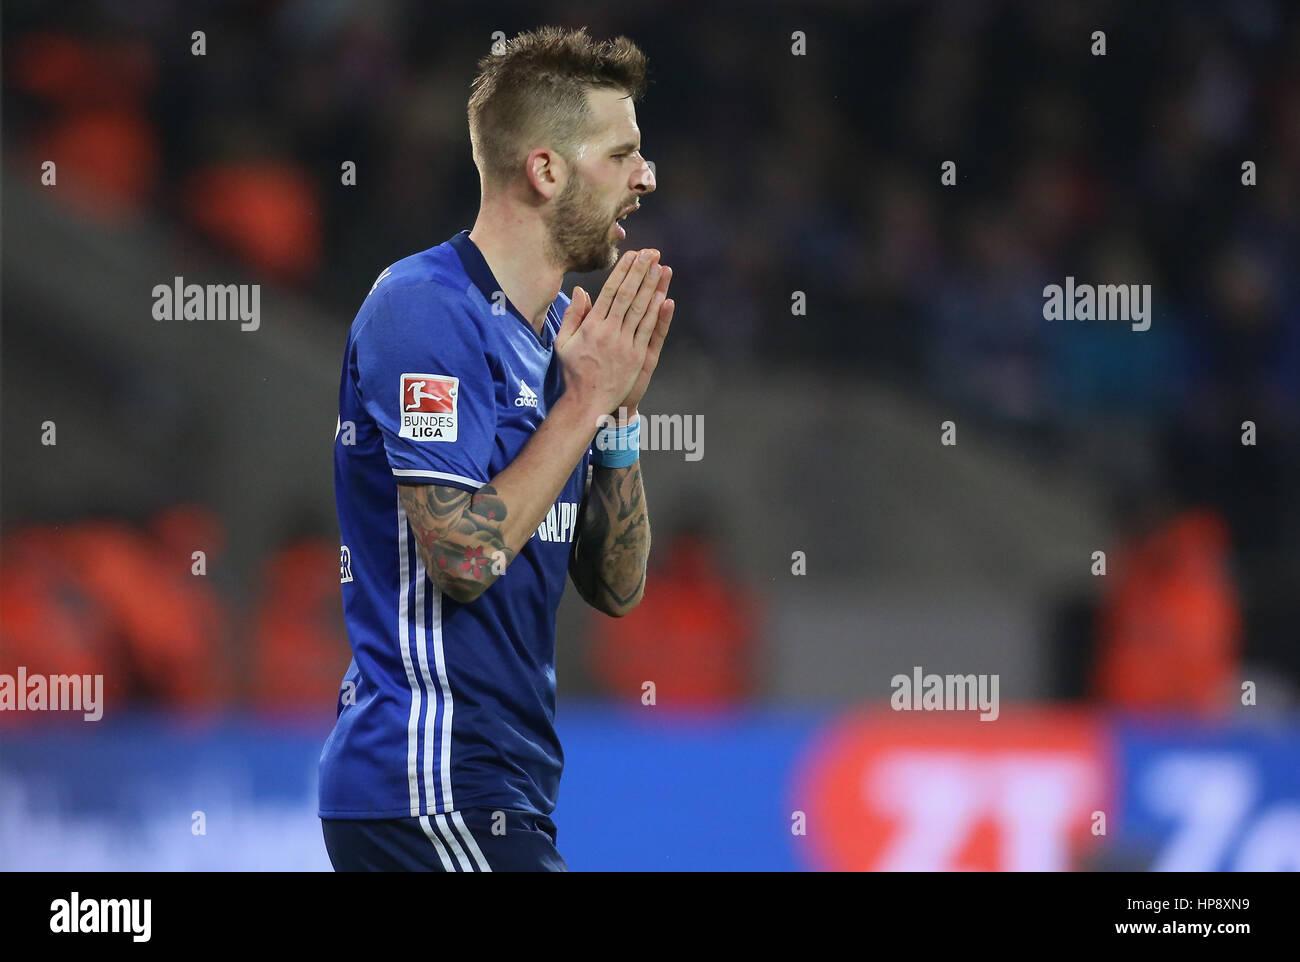 Cologne, Germany, February 19, 2017, Bundesliga matchday 21, 1. FC Koeln - FC Schalke 04:  Guido Burgstaller (Schalke) - Stock Image